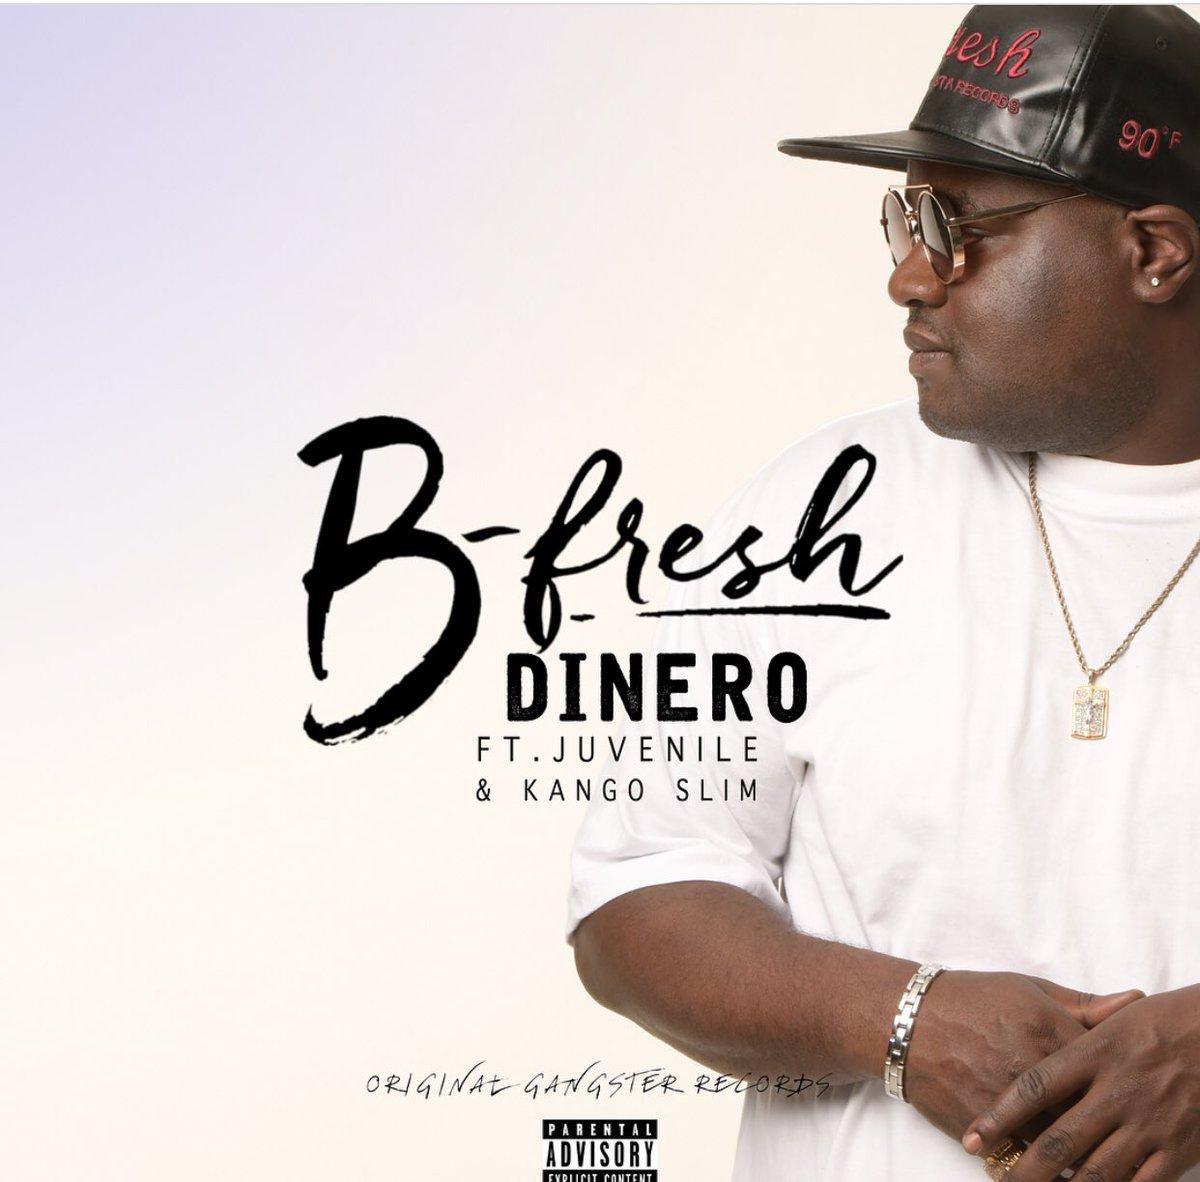 Link in bio for my new single #Dinero ft. @juviethegreat &amp; @kango  @SeanCMajor  on da track mix master by: @D_XL_Robertson I'm up one!!! OGR XLP<br>http://pic.twitter.com/PMwNzoSSDl